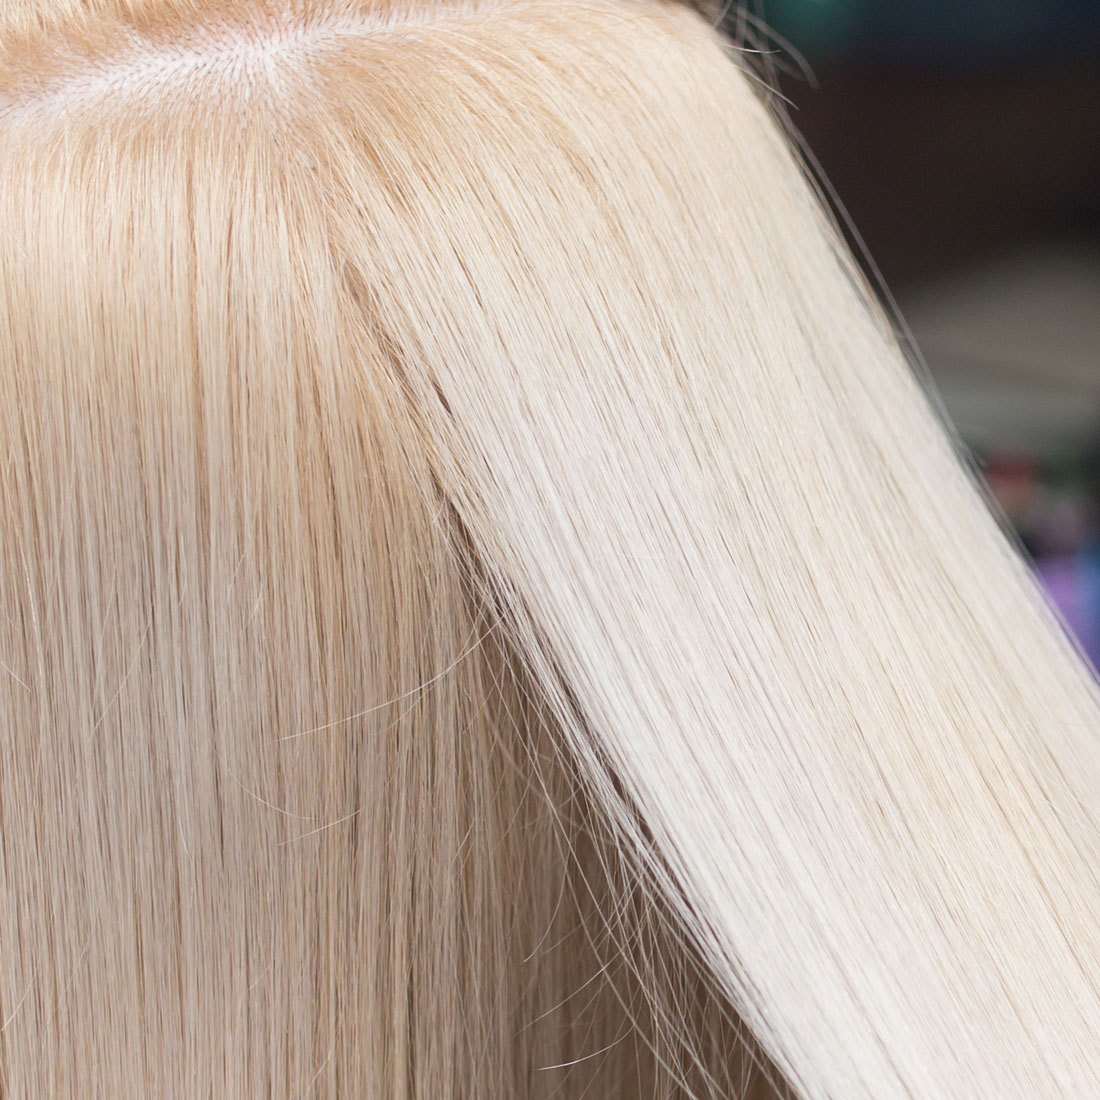 Hair getting blow dry